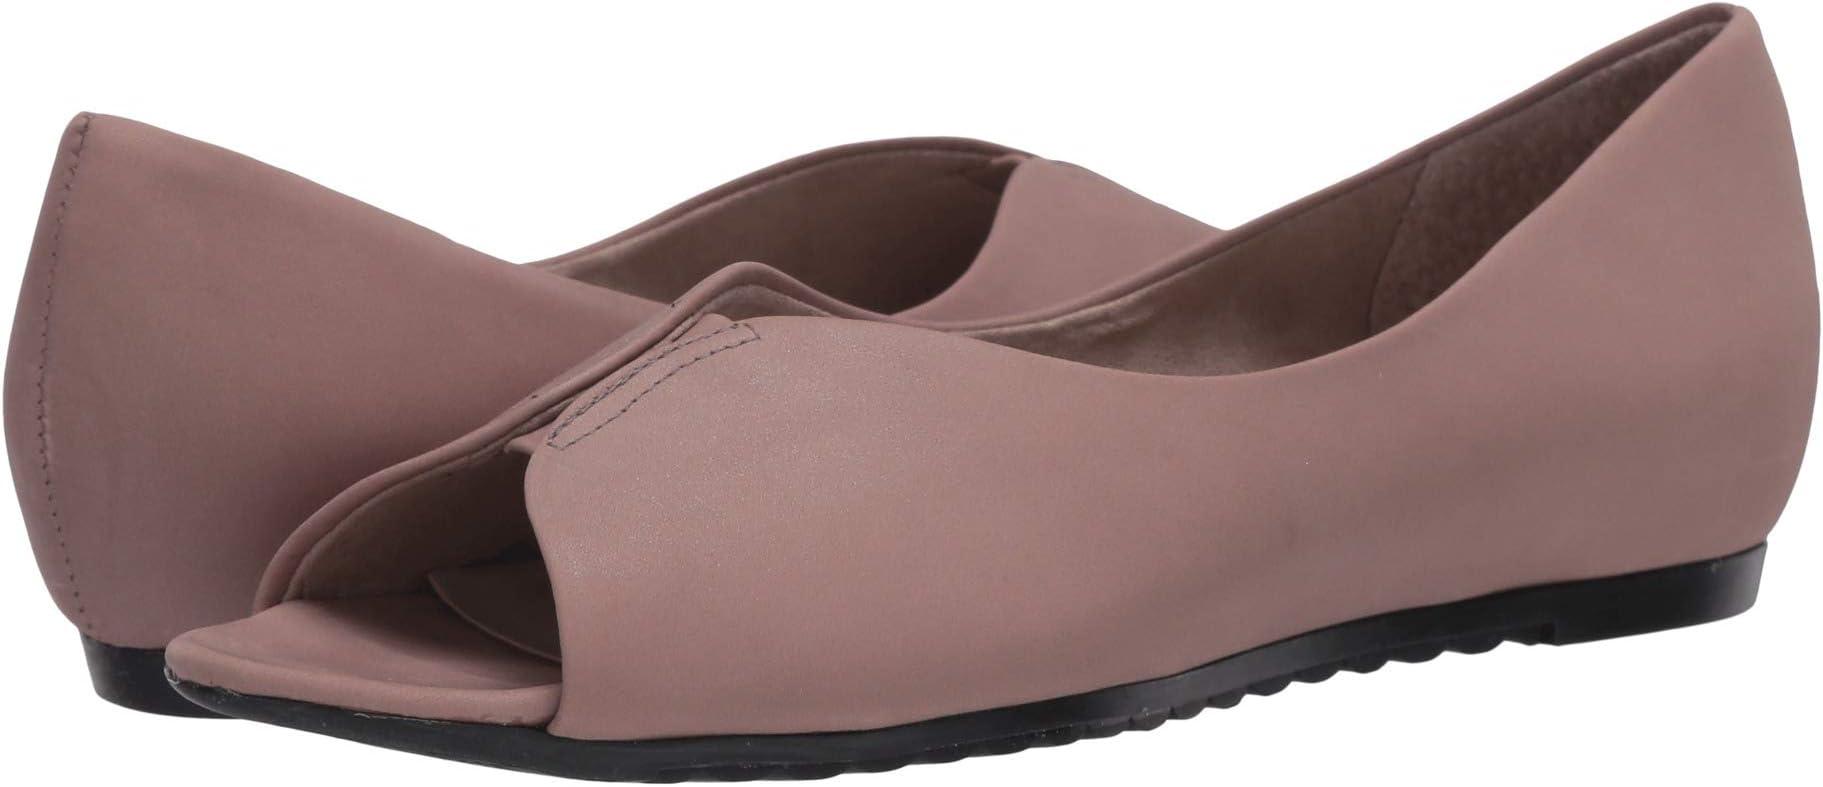 Munro Shoes   Free Shipping   Zappos.com